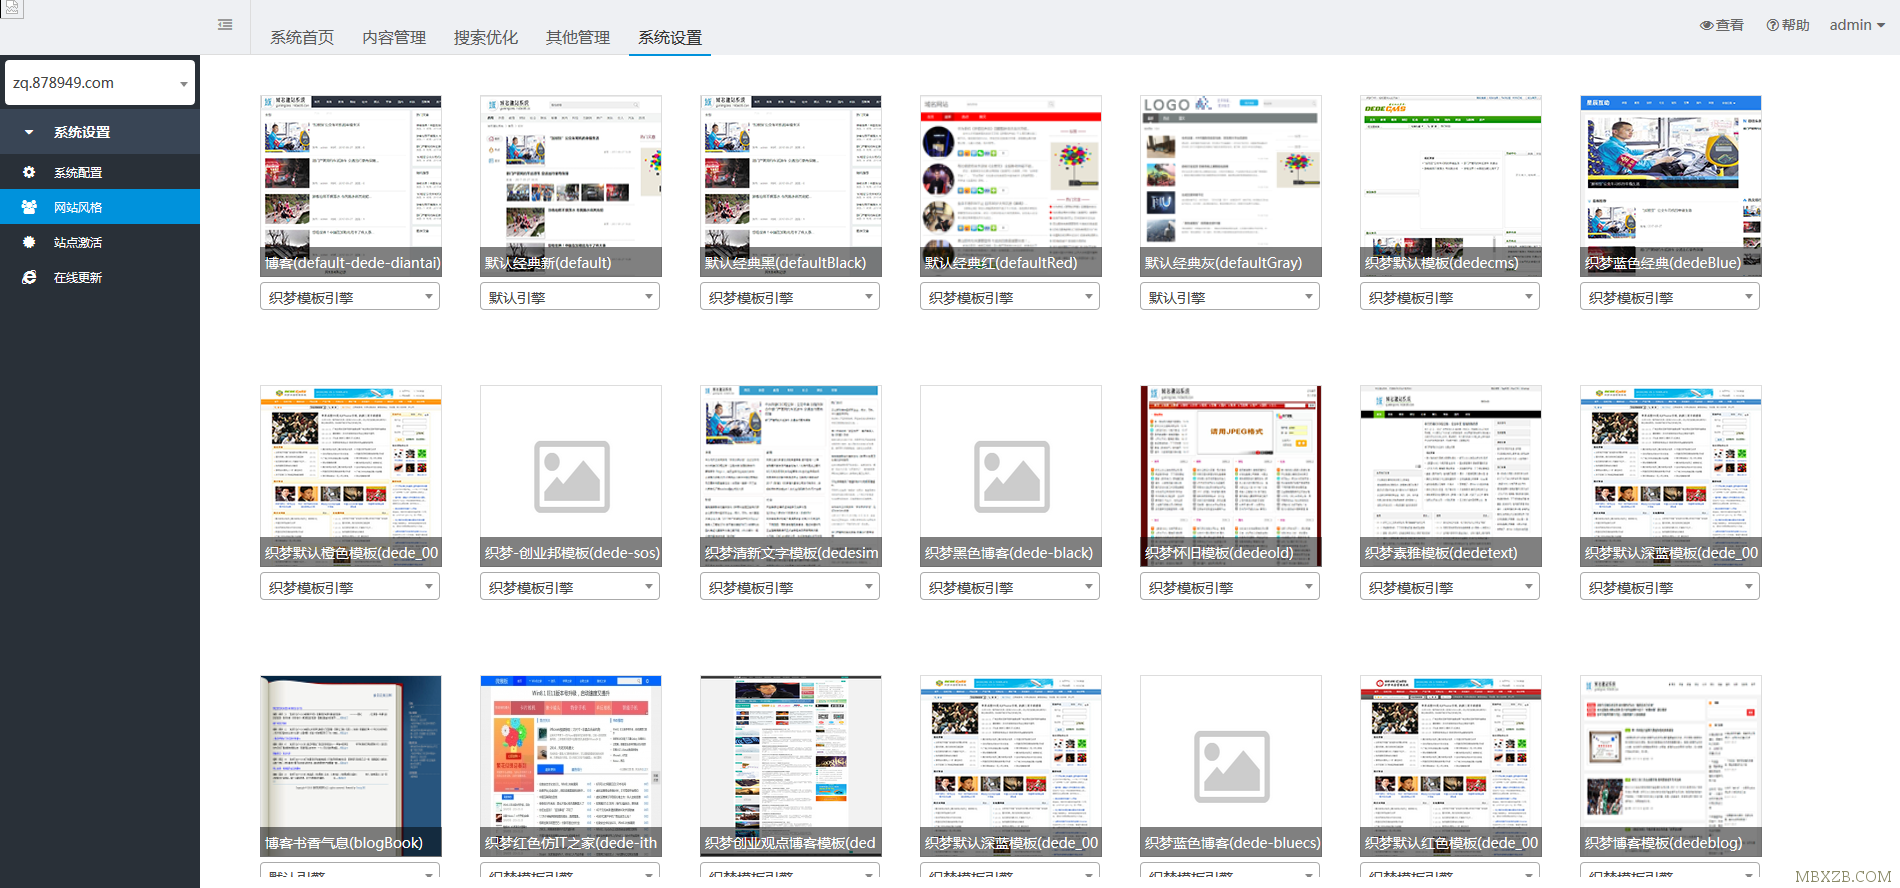 PHP站群系统_超强SEO功能_全天自动采集_可以同时管理数百个网站